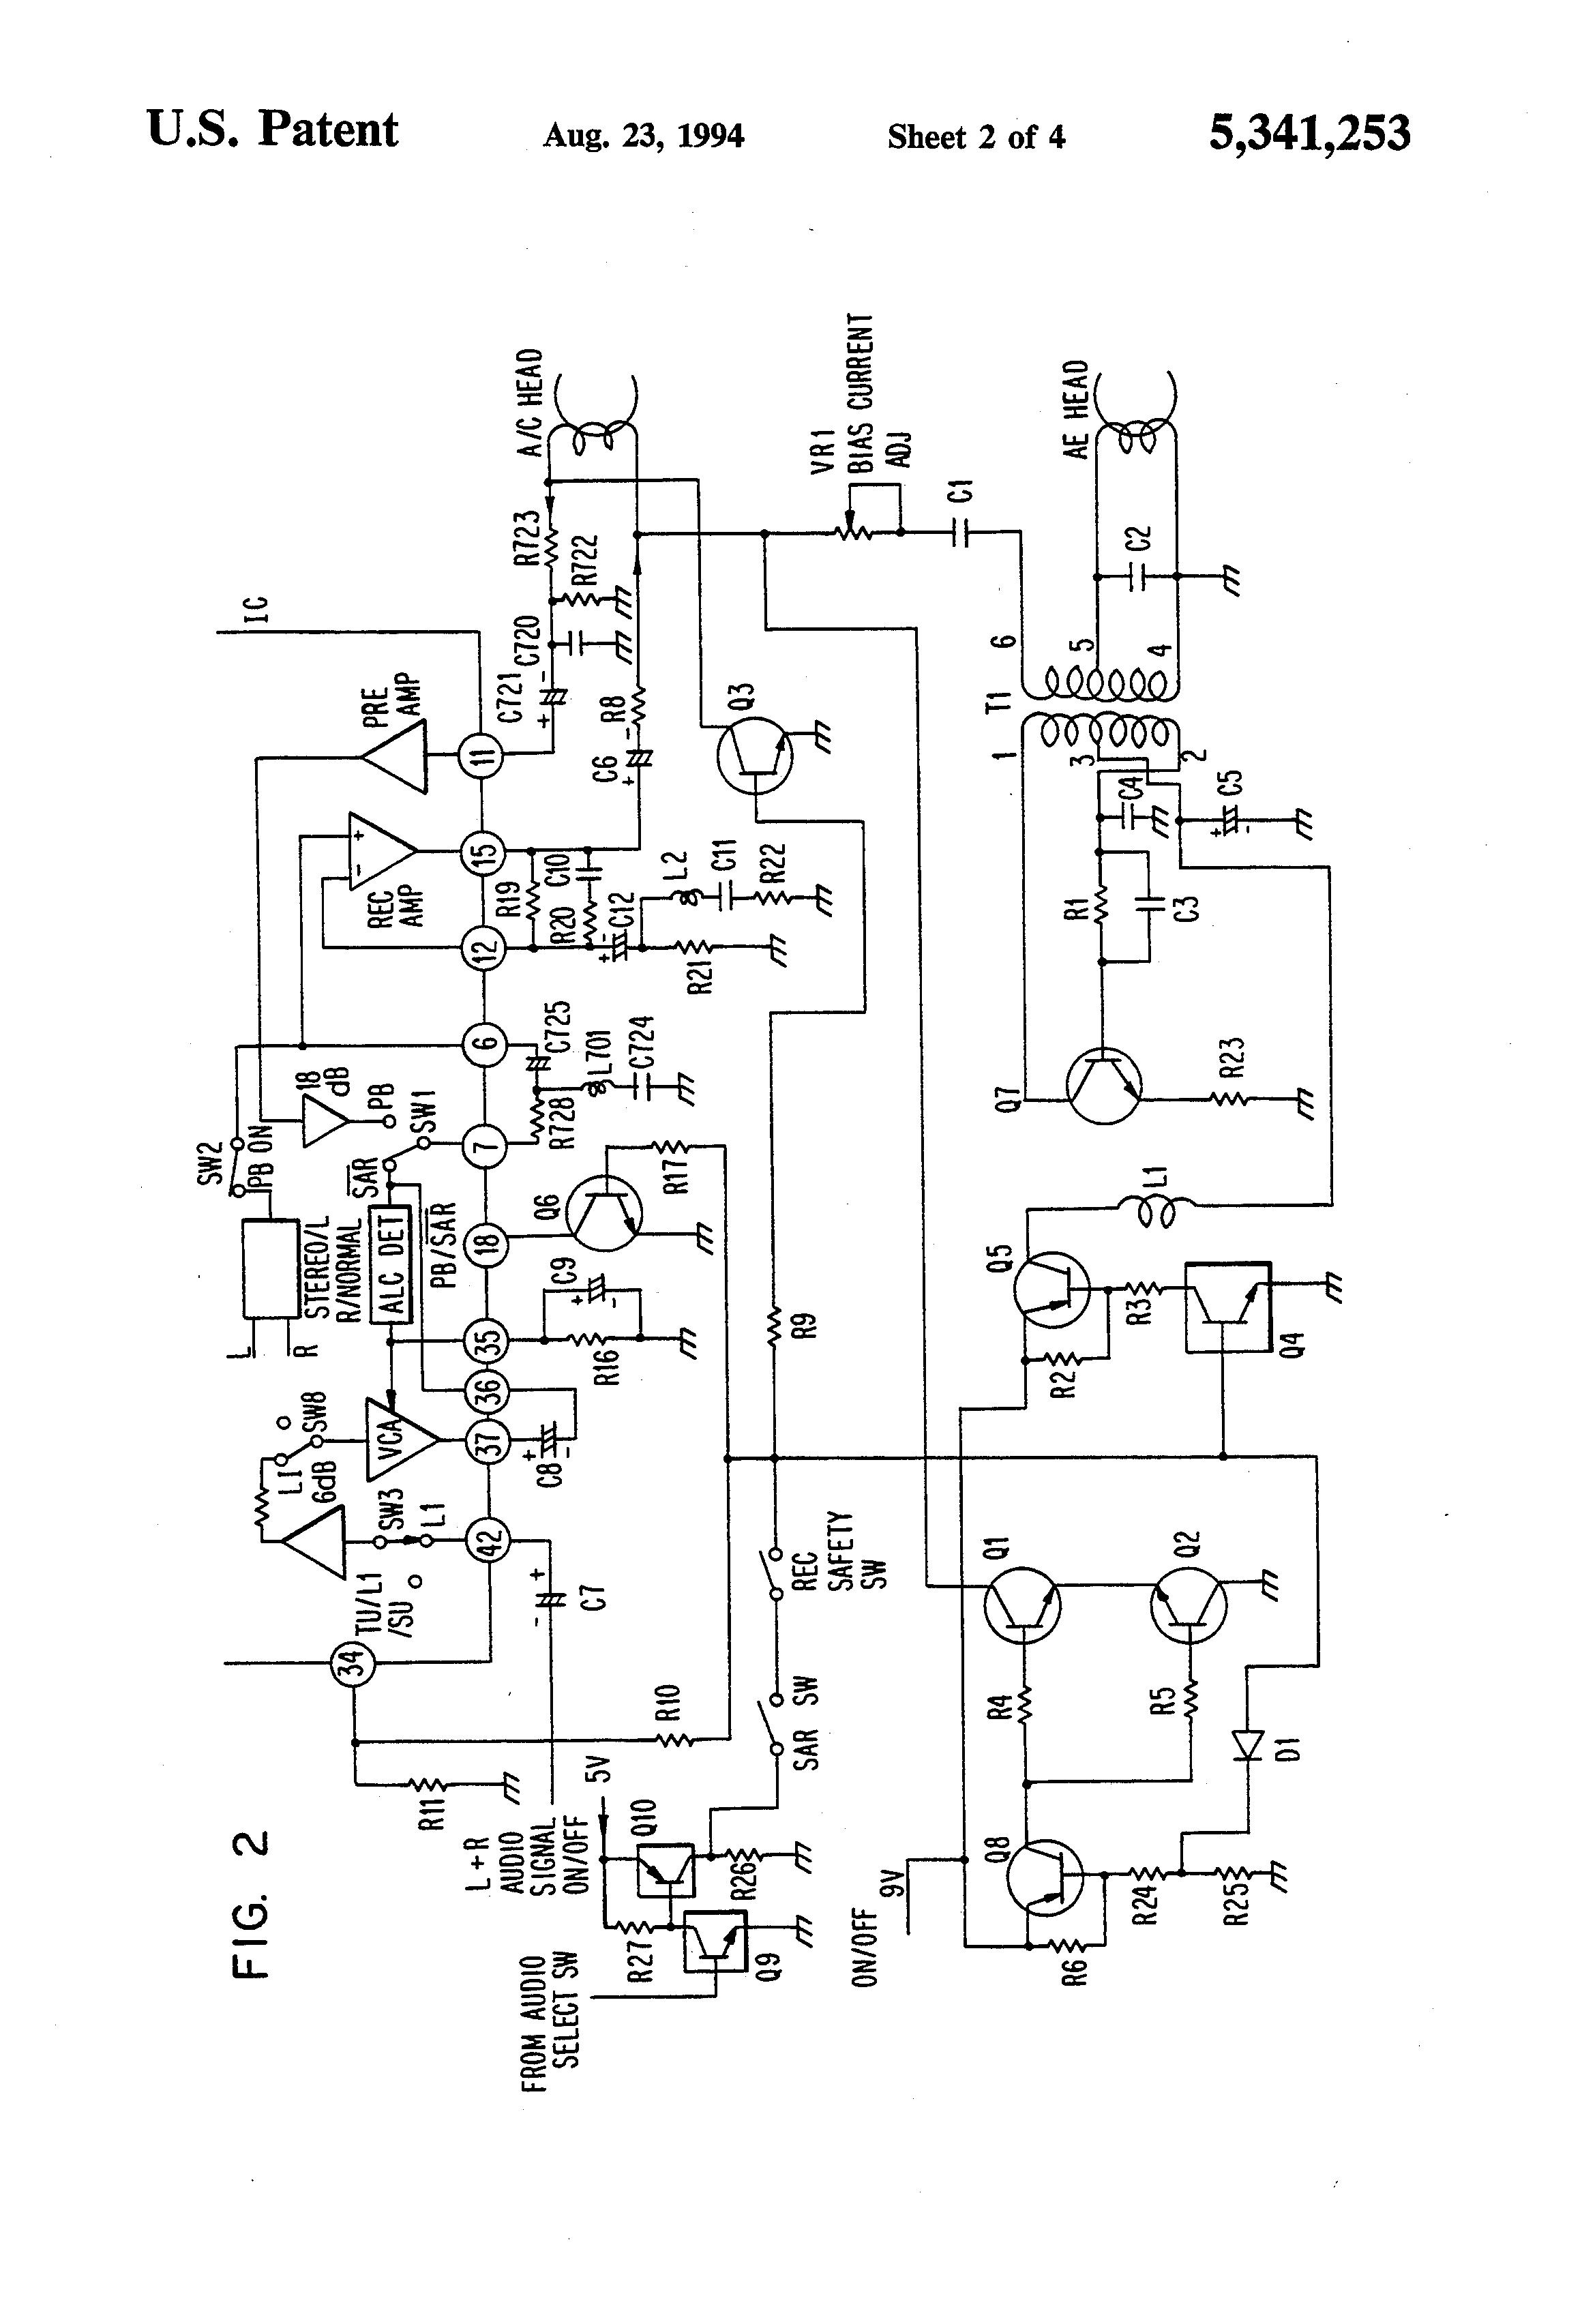 Wiring Diagram Videoke Trusted Diagrams Karaoke Machine Electrical Schematic Circuit 1797 Images